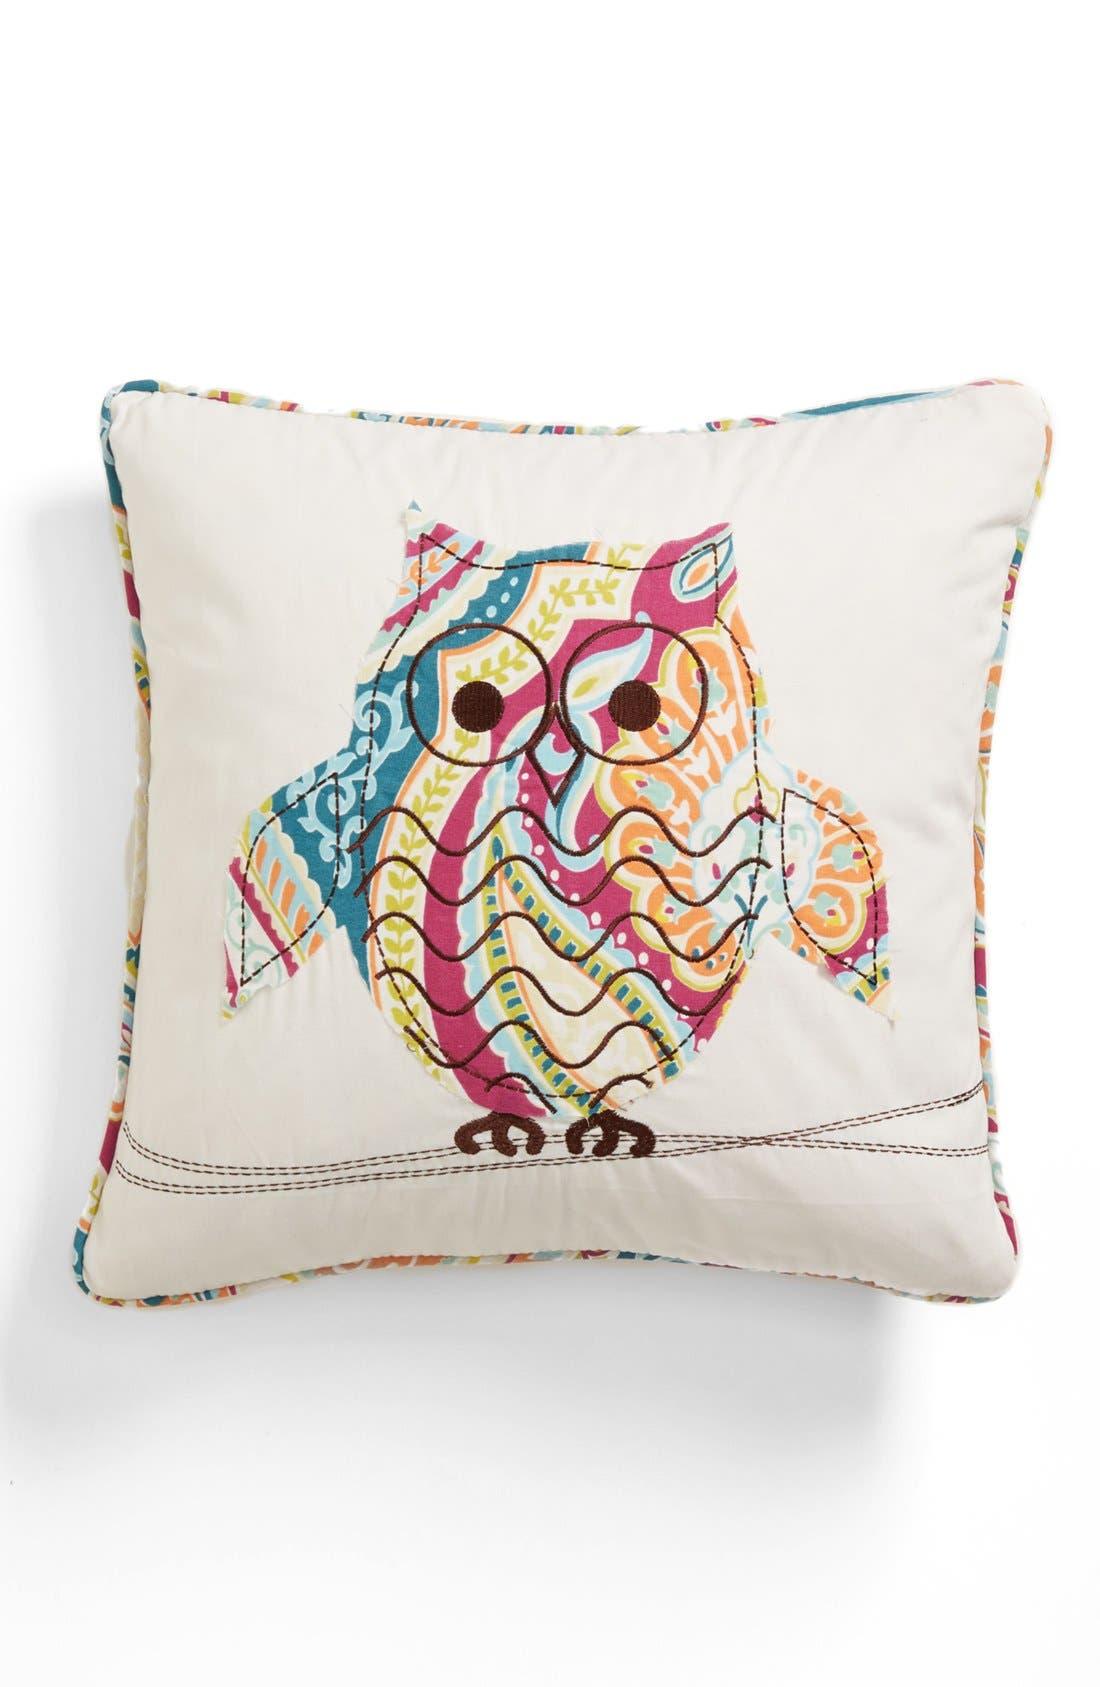 Alternate Image 1 Selected - Levtex 'Magnolia Owl' Pillow